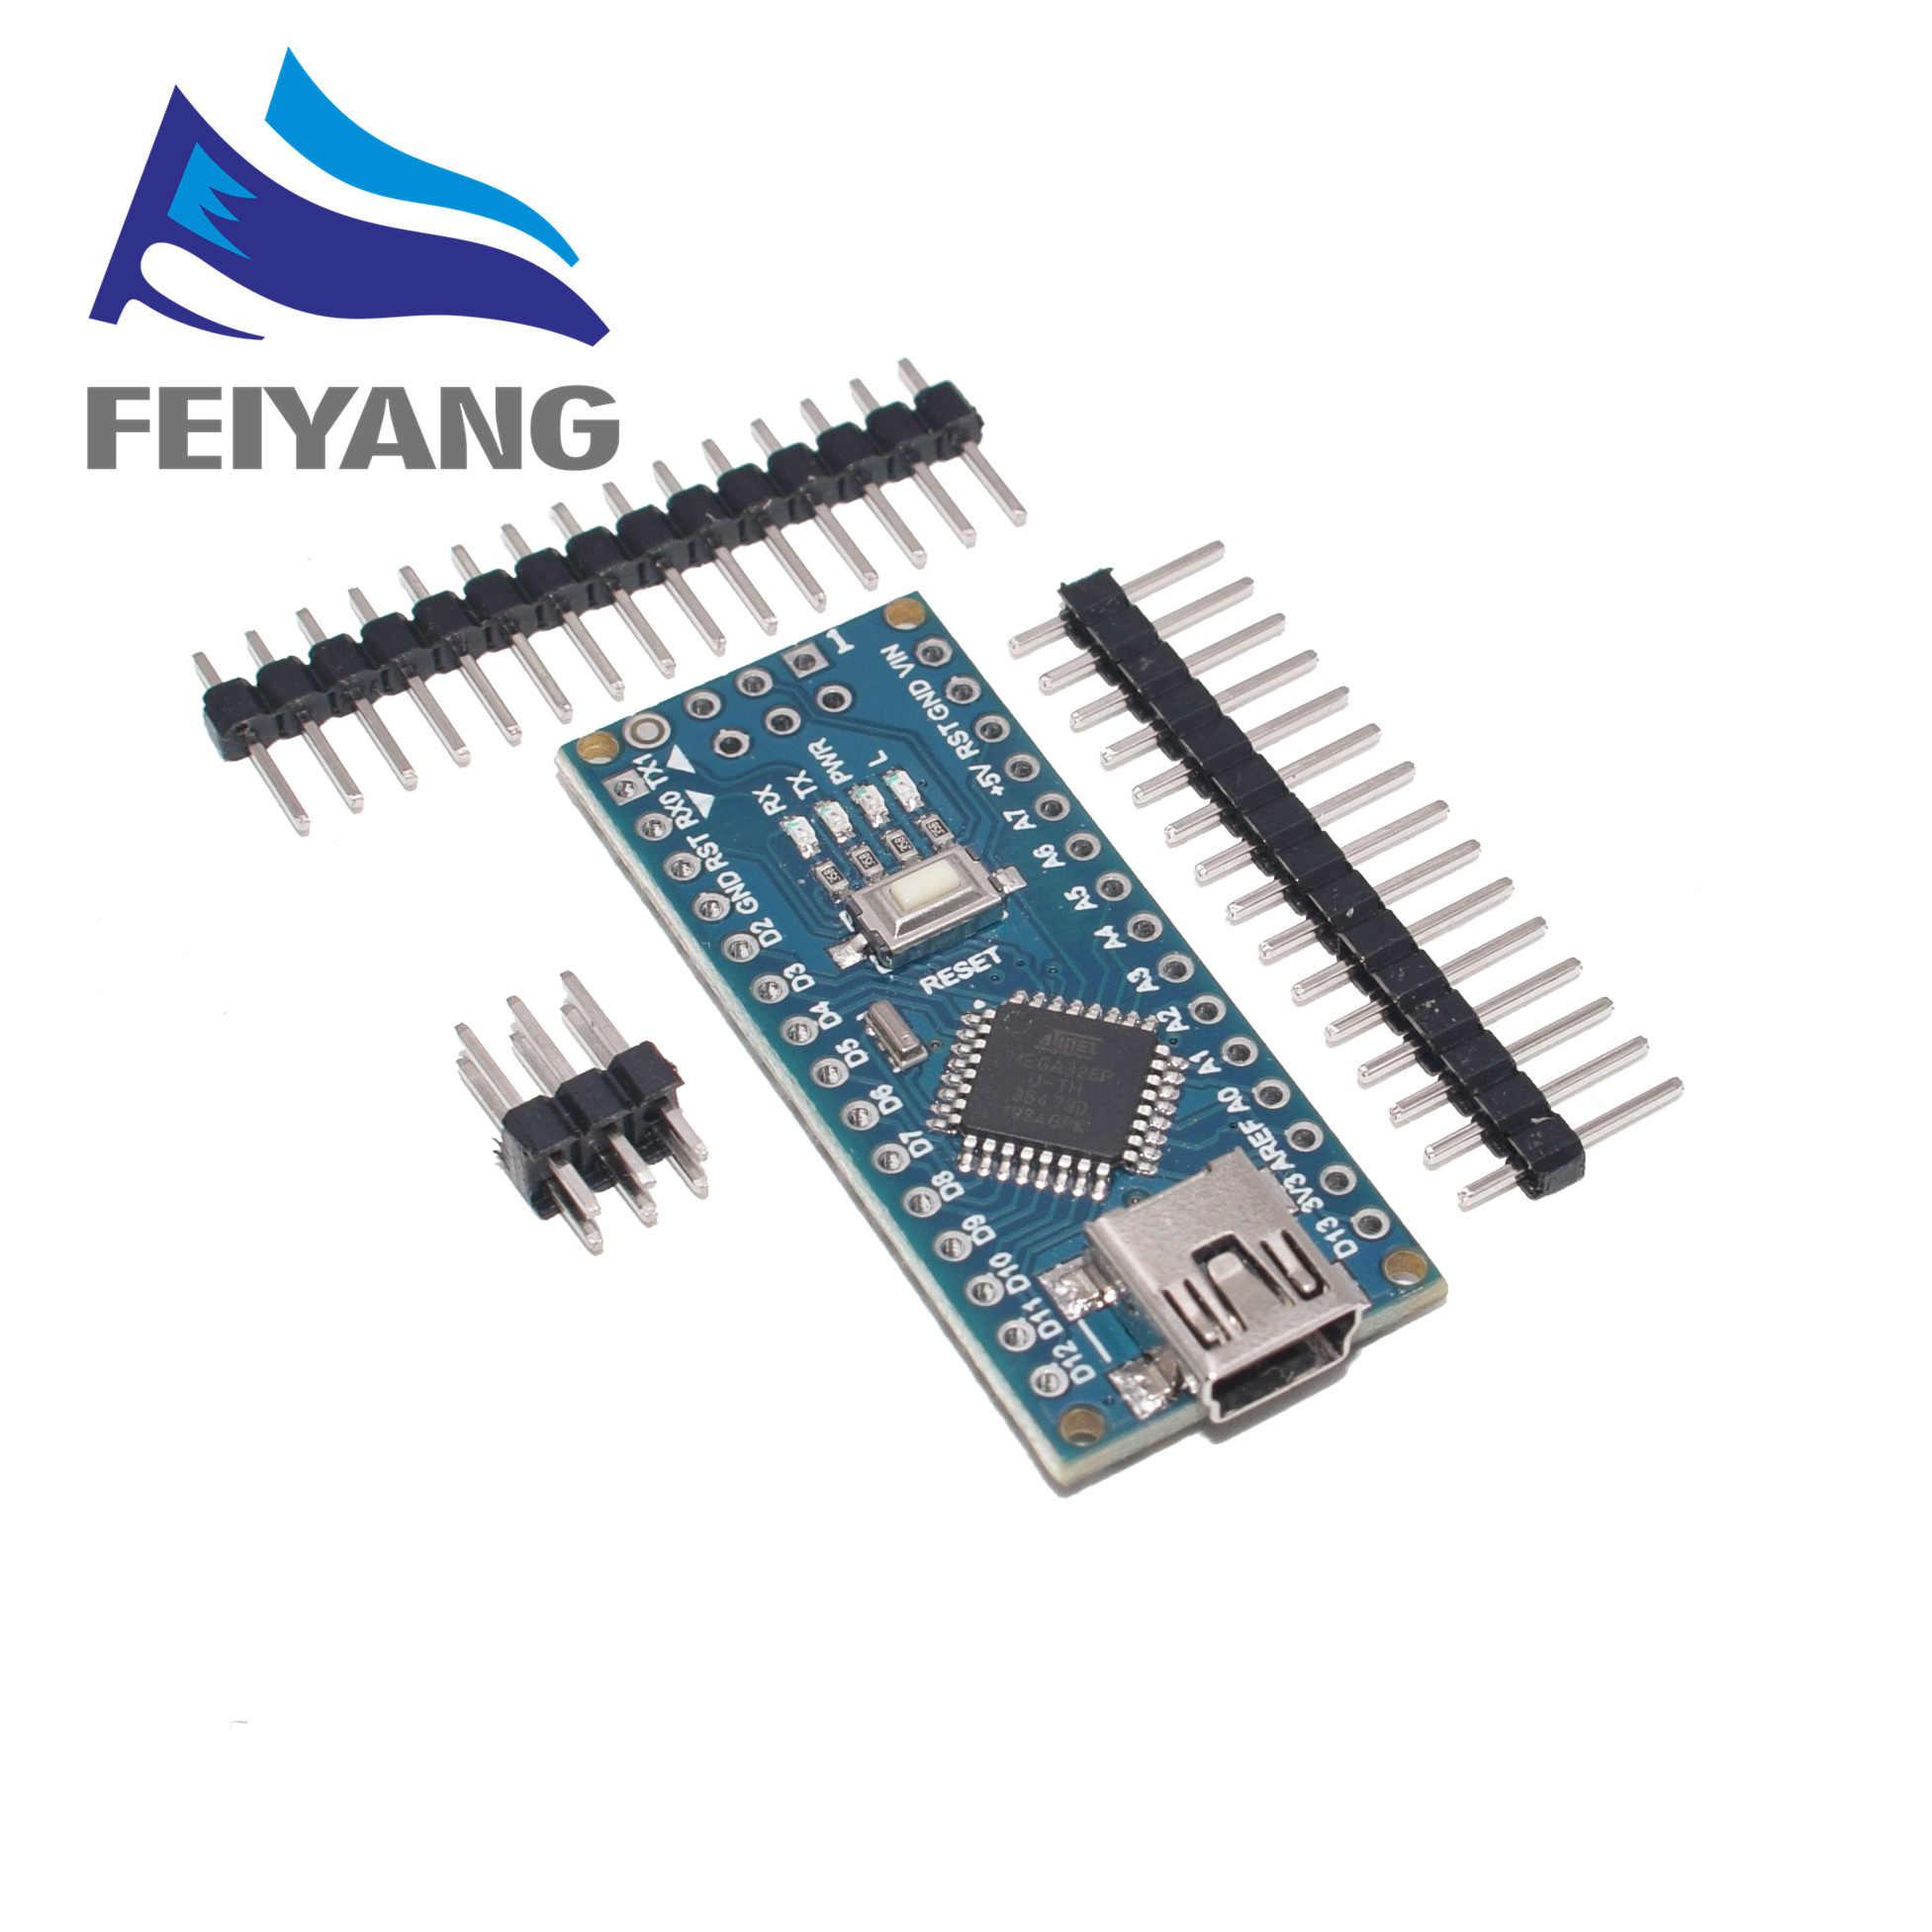 1 قطعة USB صغير مع بوتلودر نانو 3.0 تحكم متوافق ل اردوينو CH340 برنامج تشغيل USB 16 ميجا هرتز نانو V3.0 Atmega328P